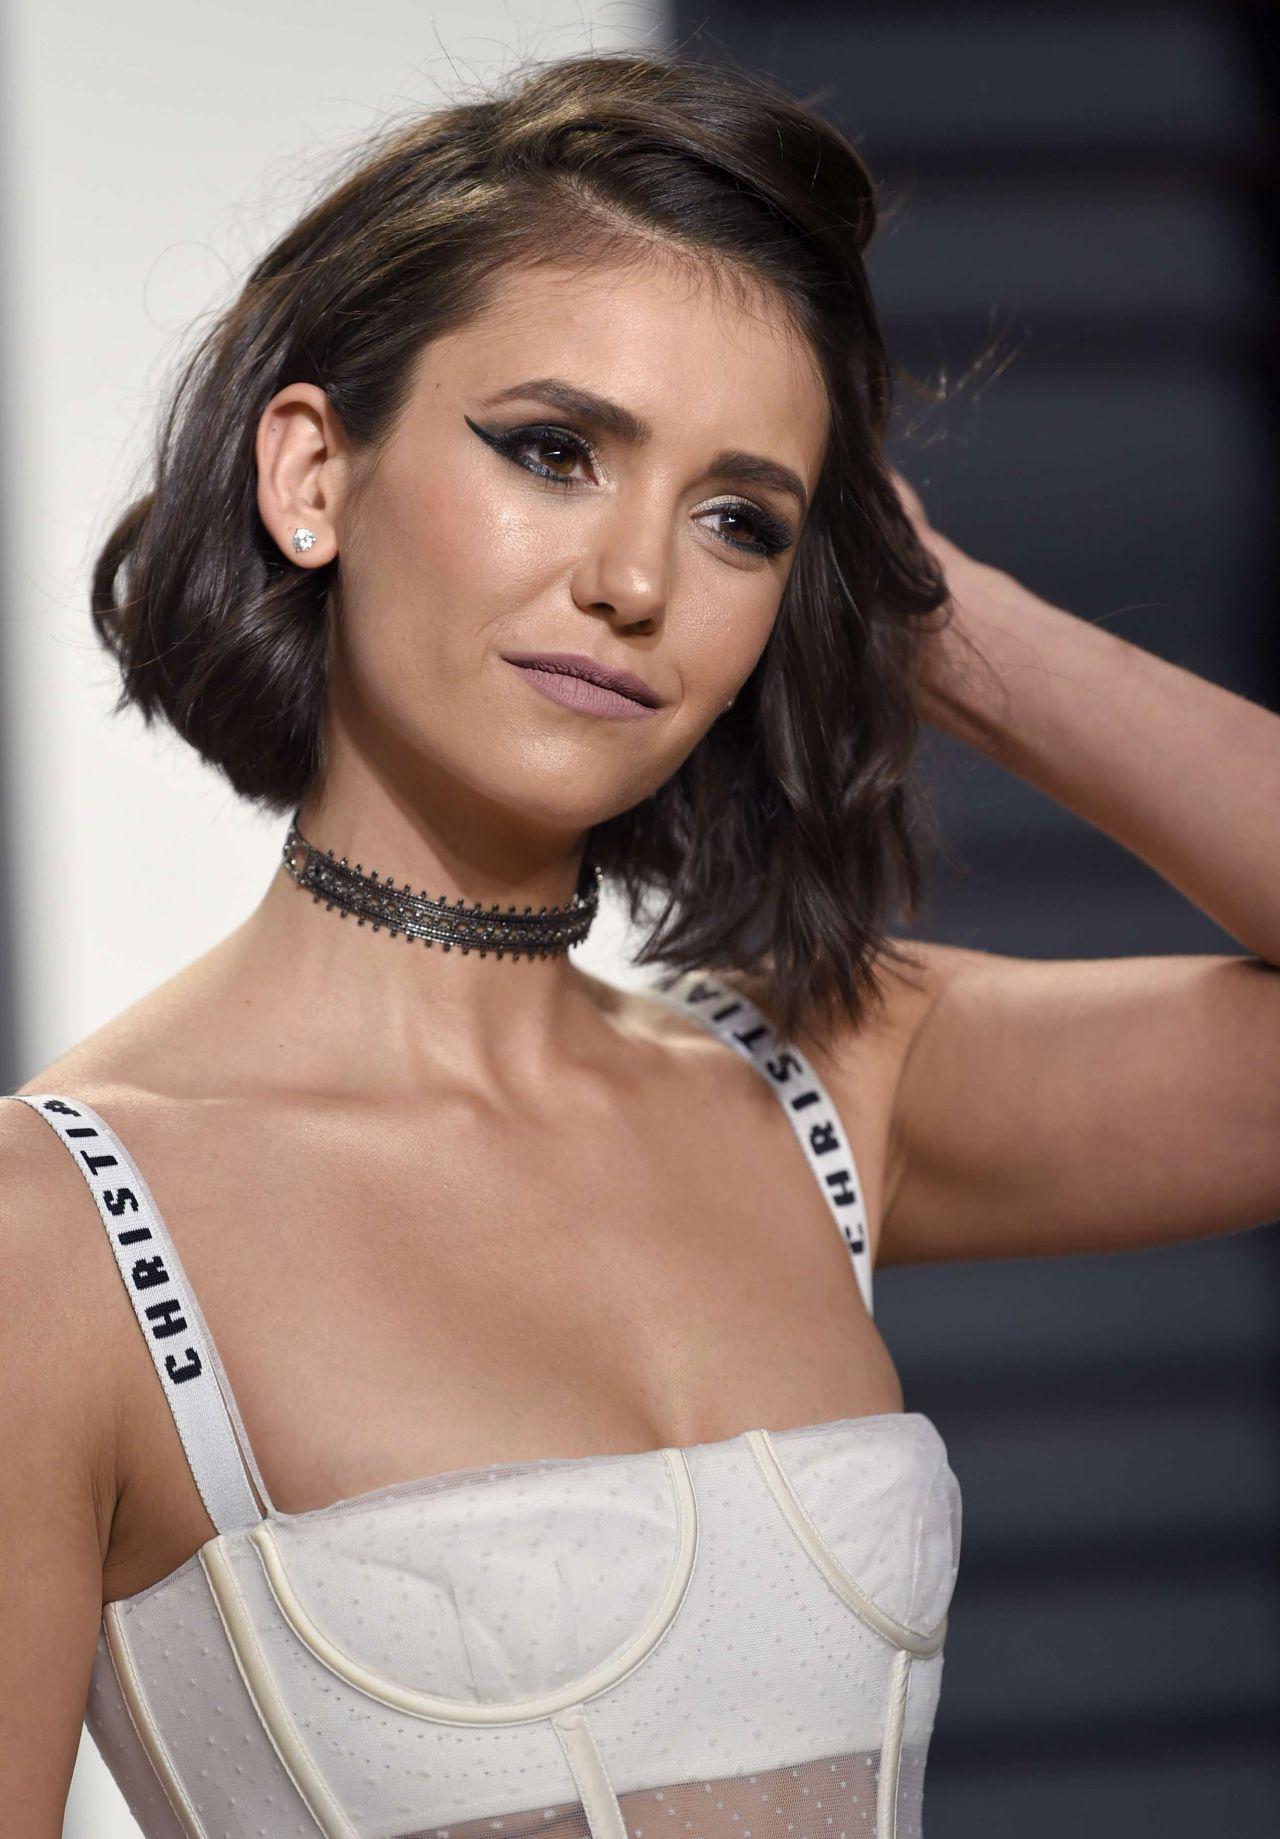 Nina Dobrev At Vanity Fair Oscar 2017 Party In Los Angeles